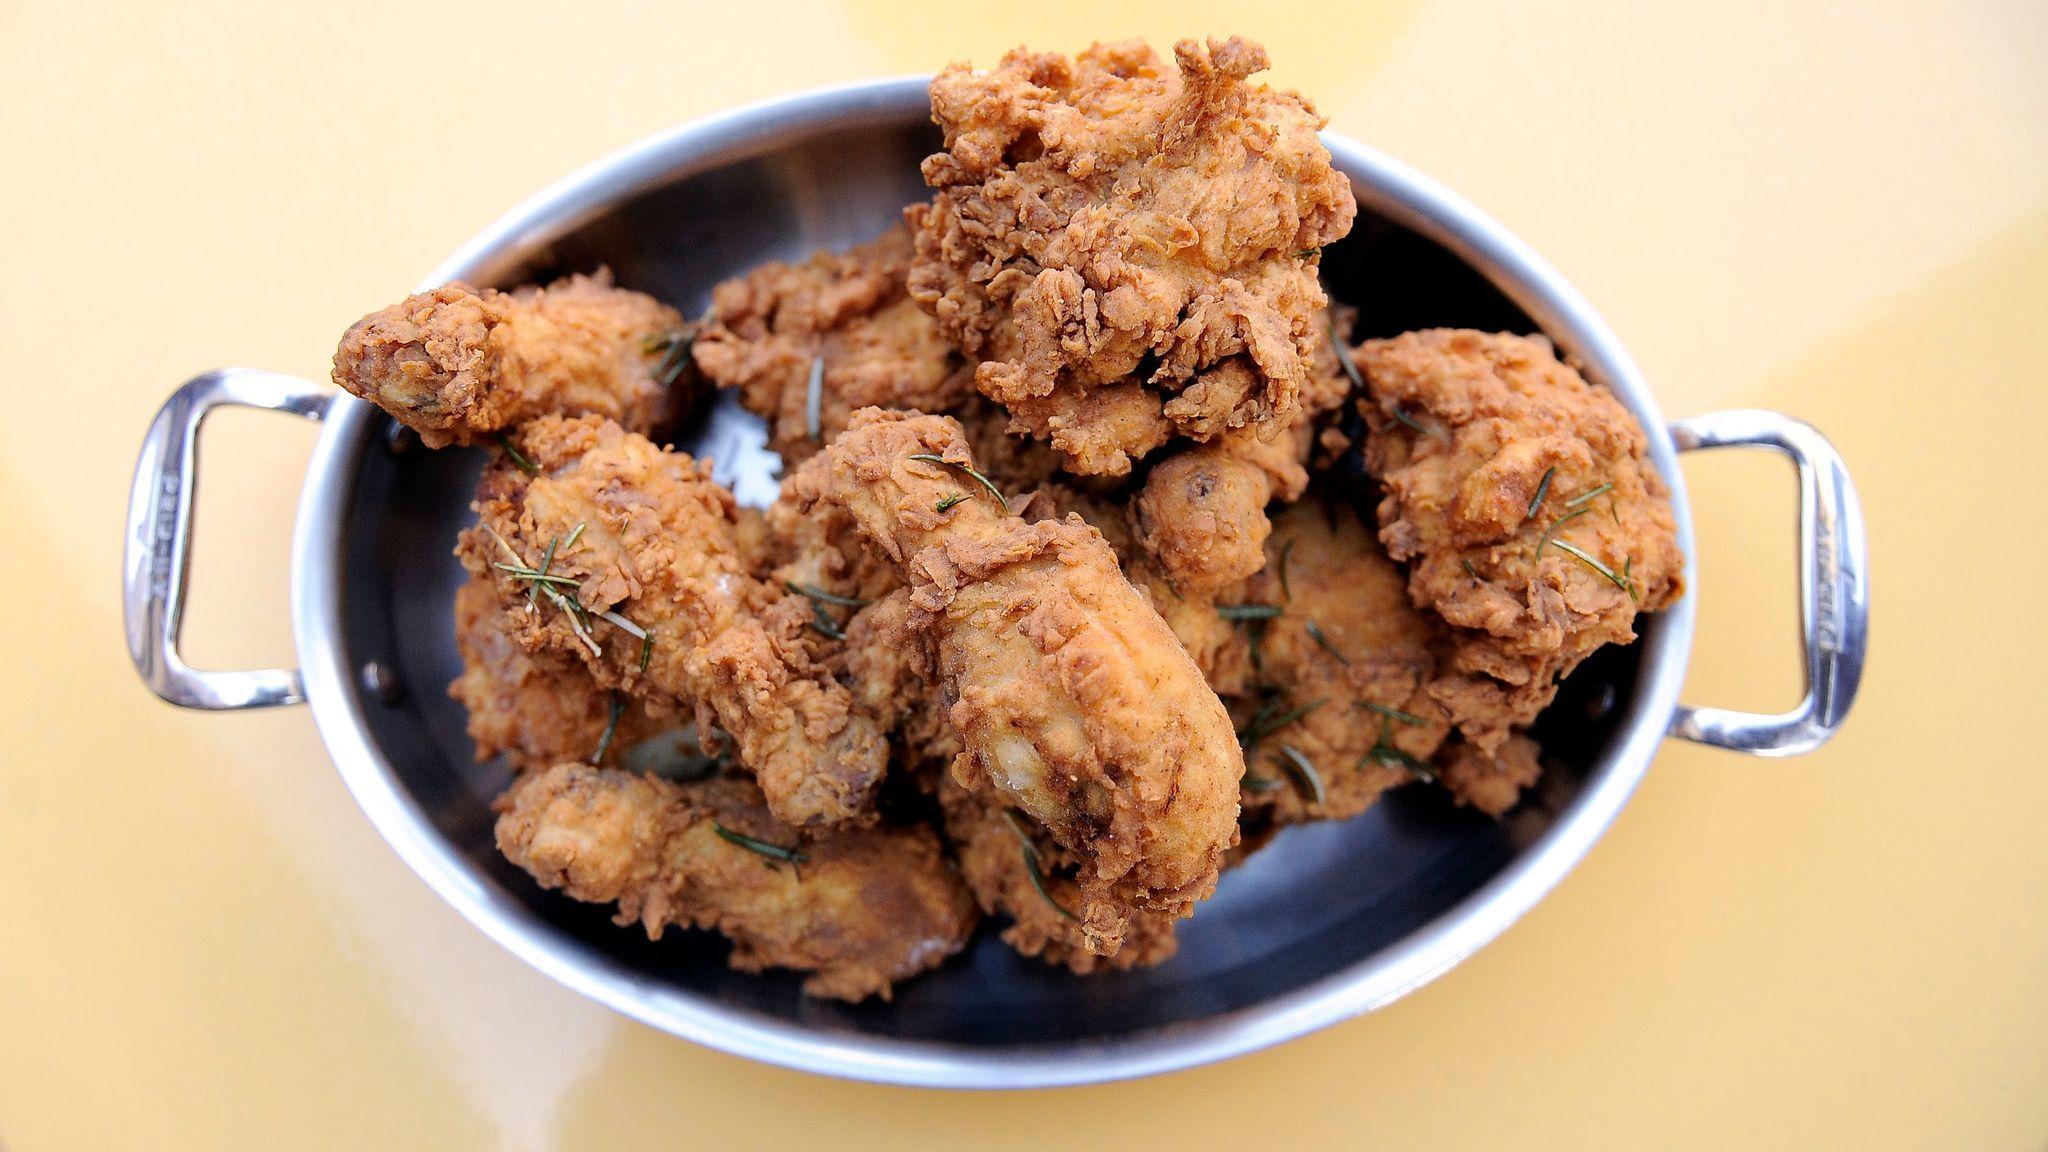 Bouchon serves fried chicken every Monday night.